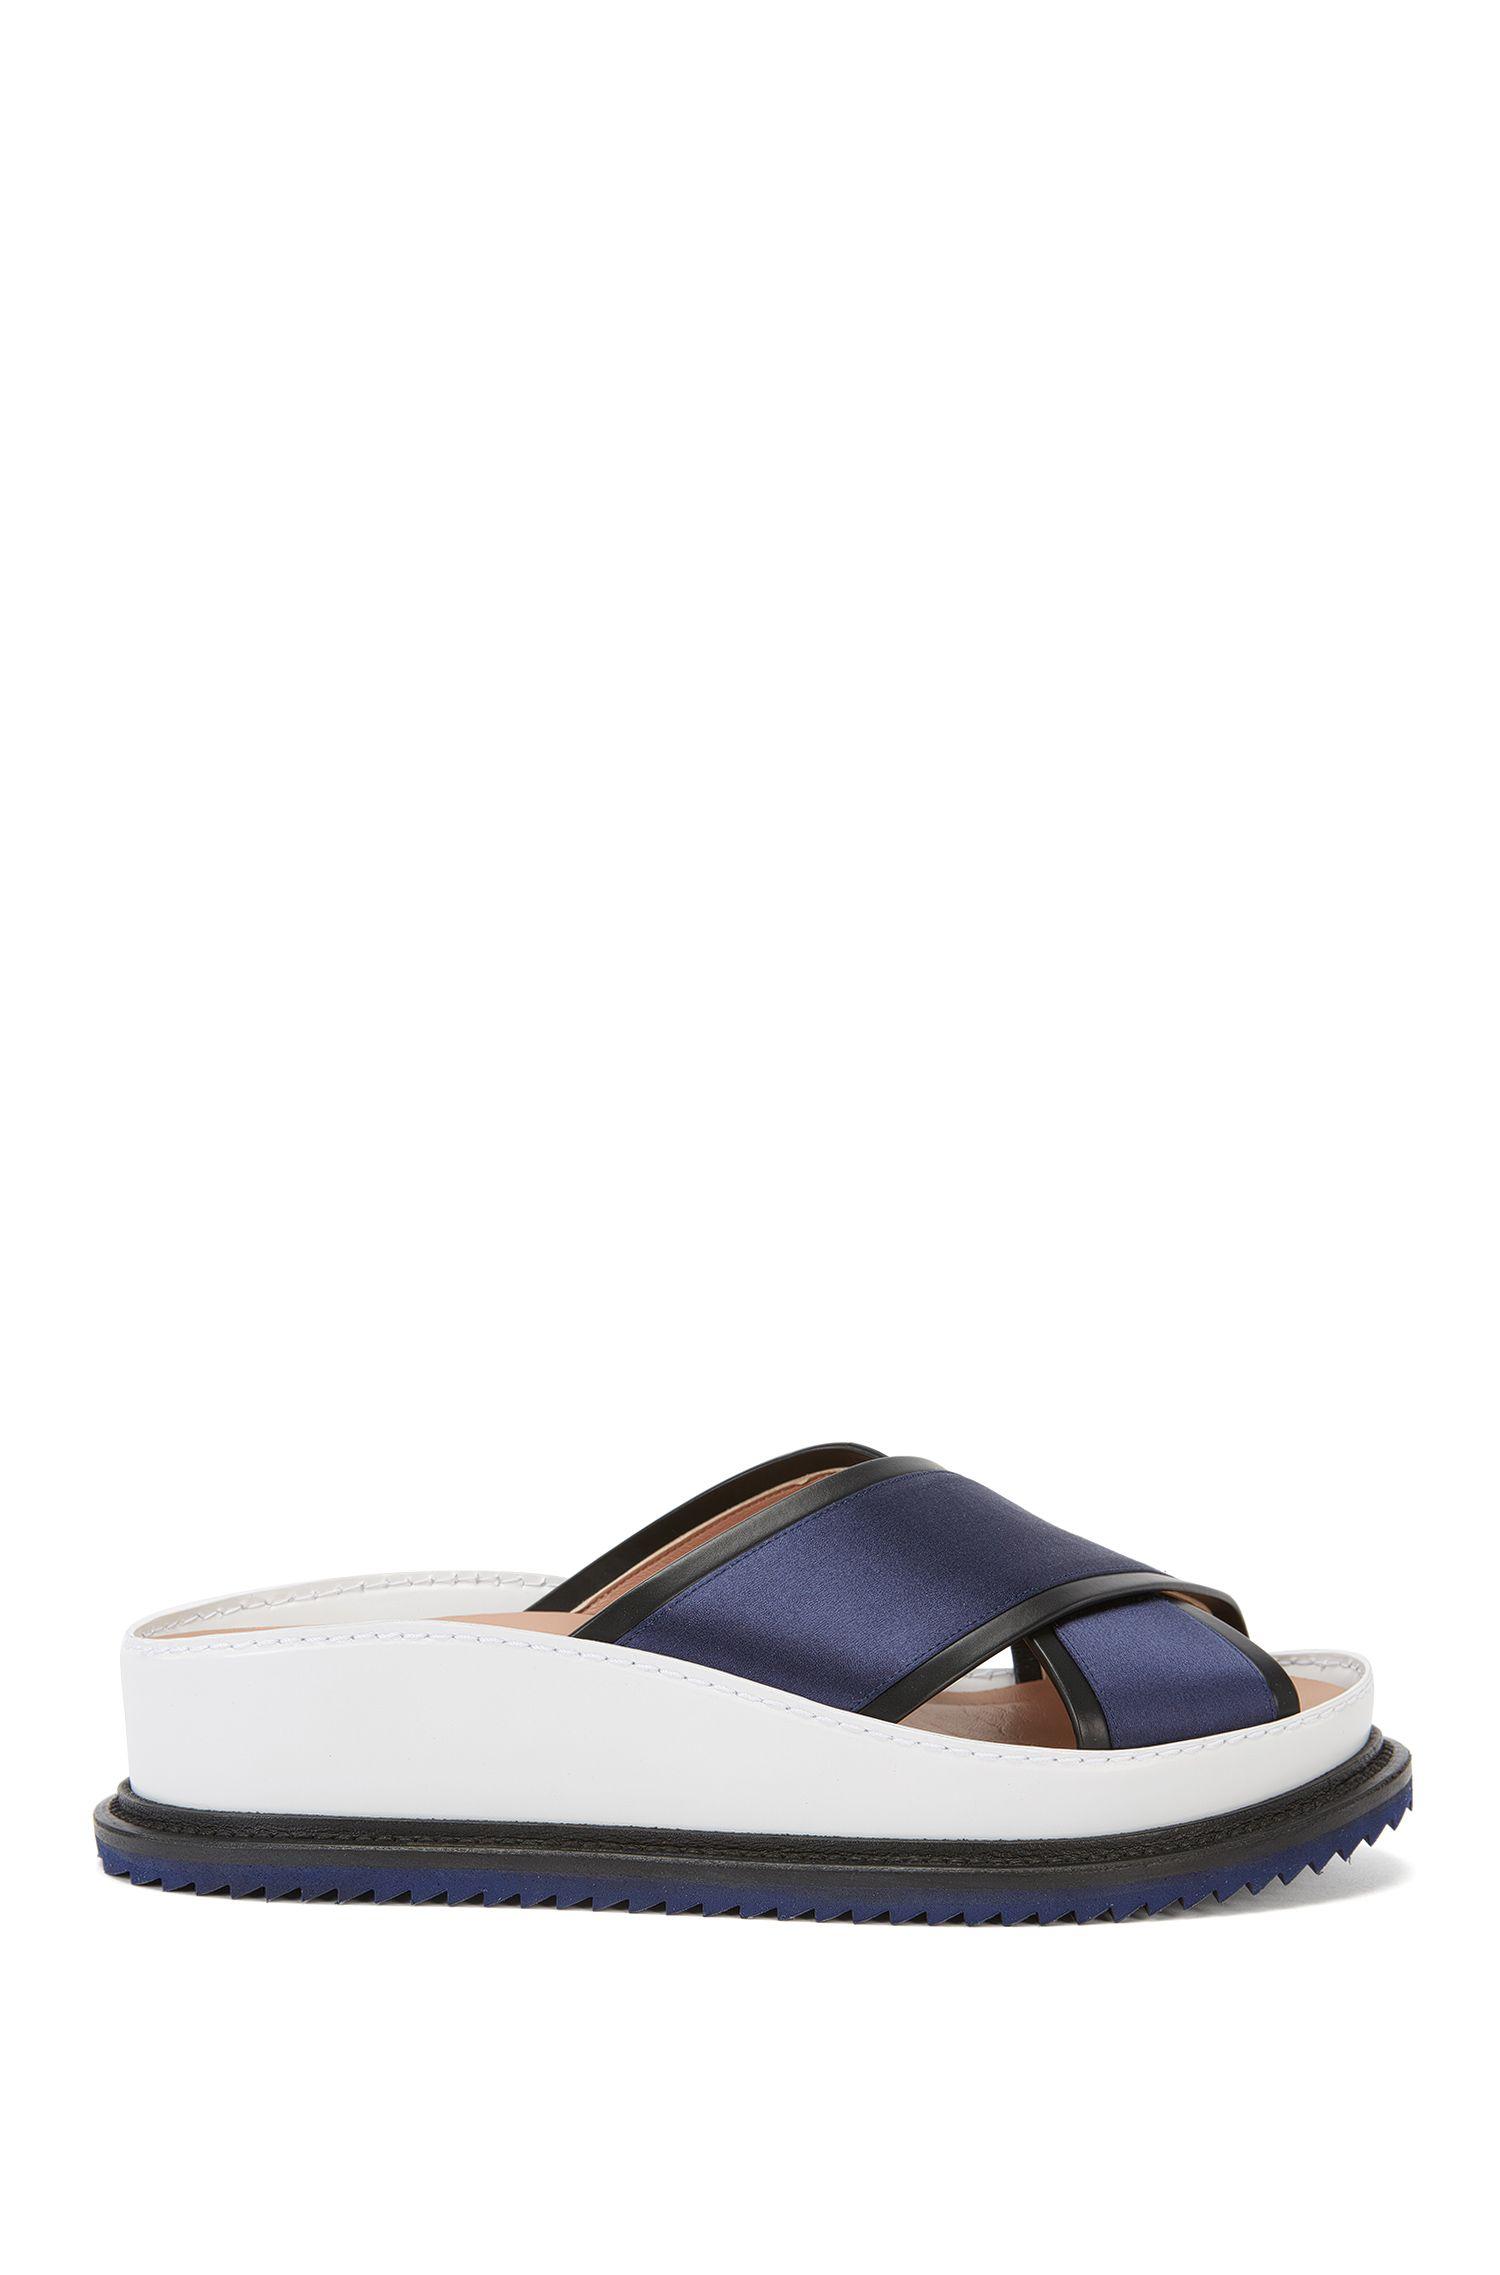 Runway Edition-slippers van leer met satijnbeleg: 'Raily Flat Satin'